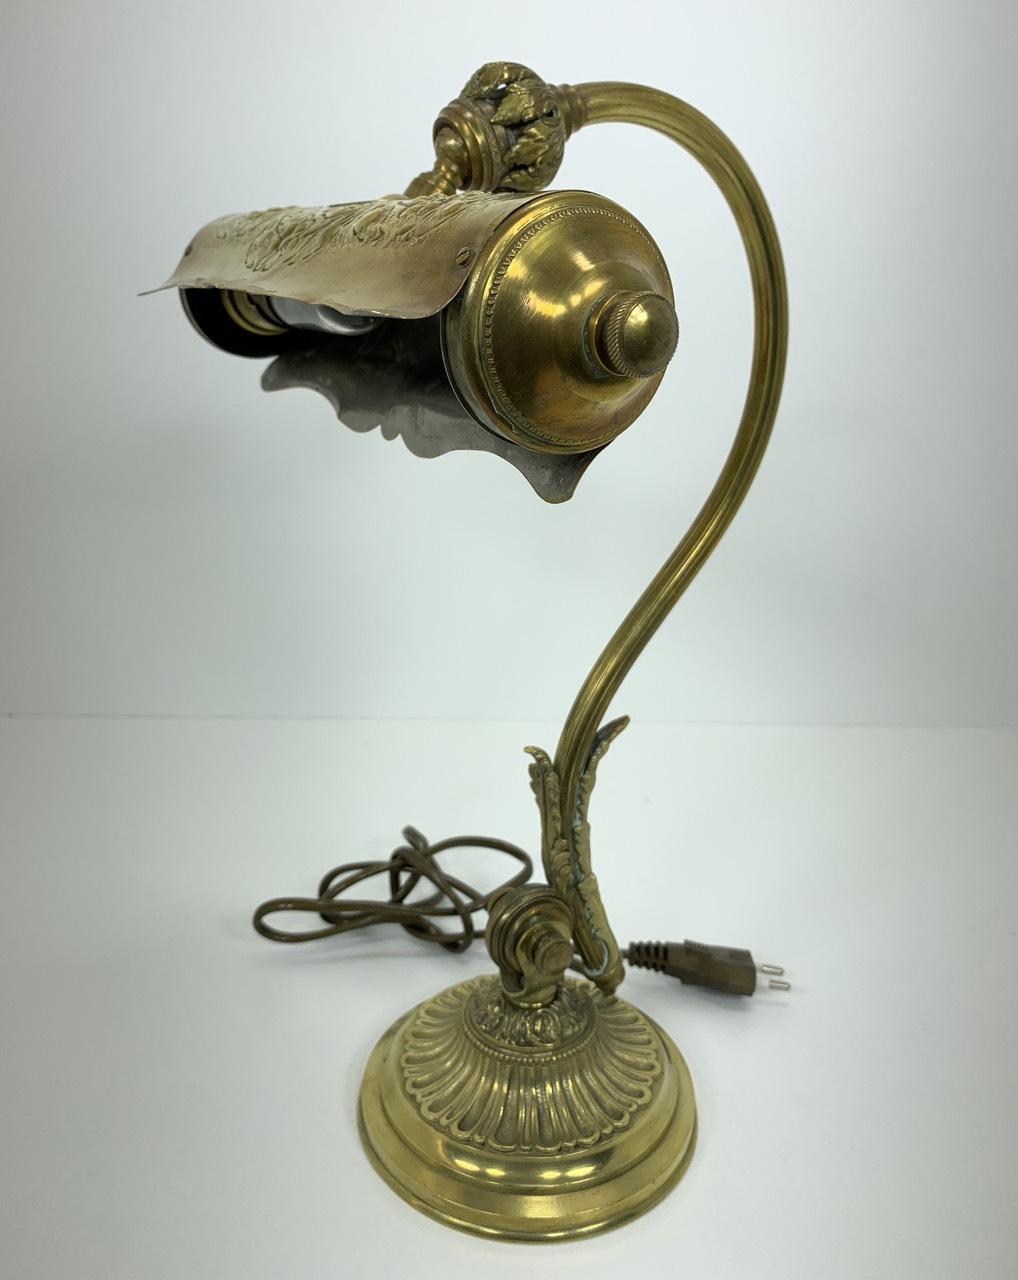 Антикварная настольная лампа из бронзы и латуни